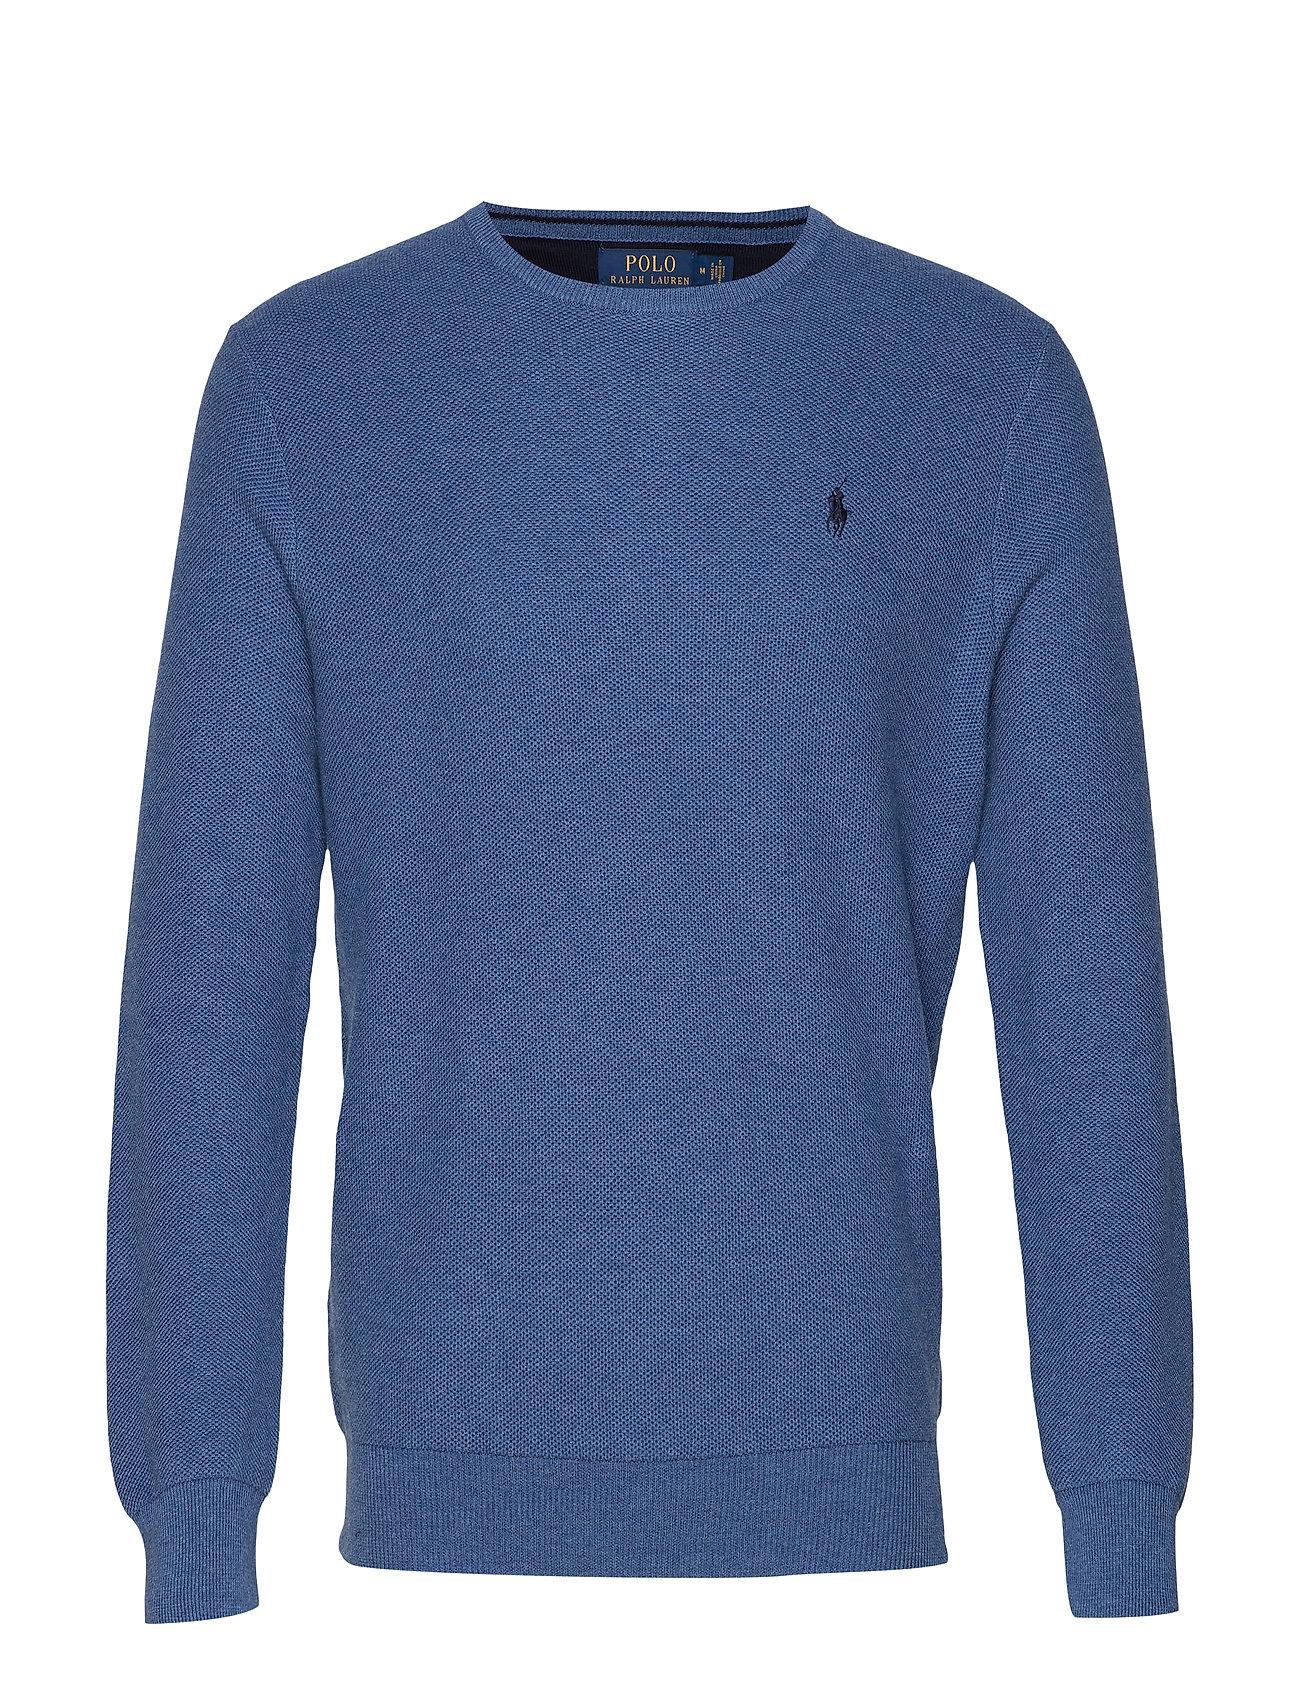 Polo Ralph Lauren Cotton Crewneck Sweater - ROYAL HEATHER